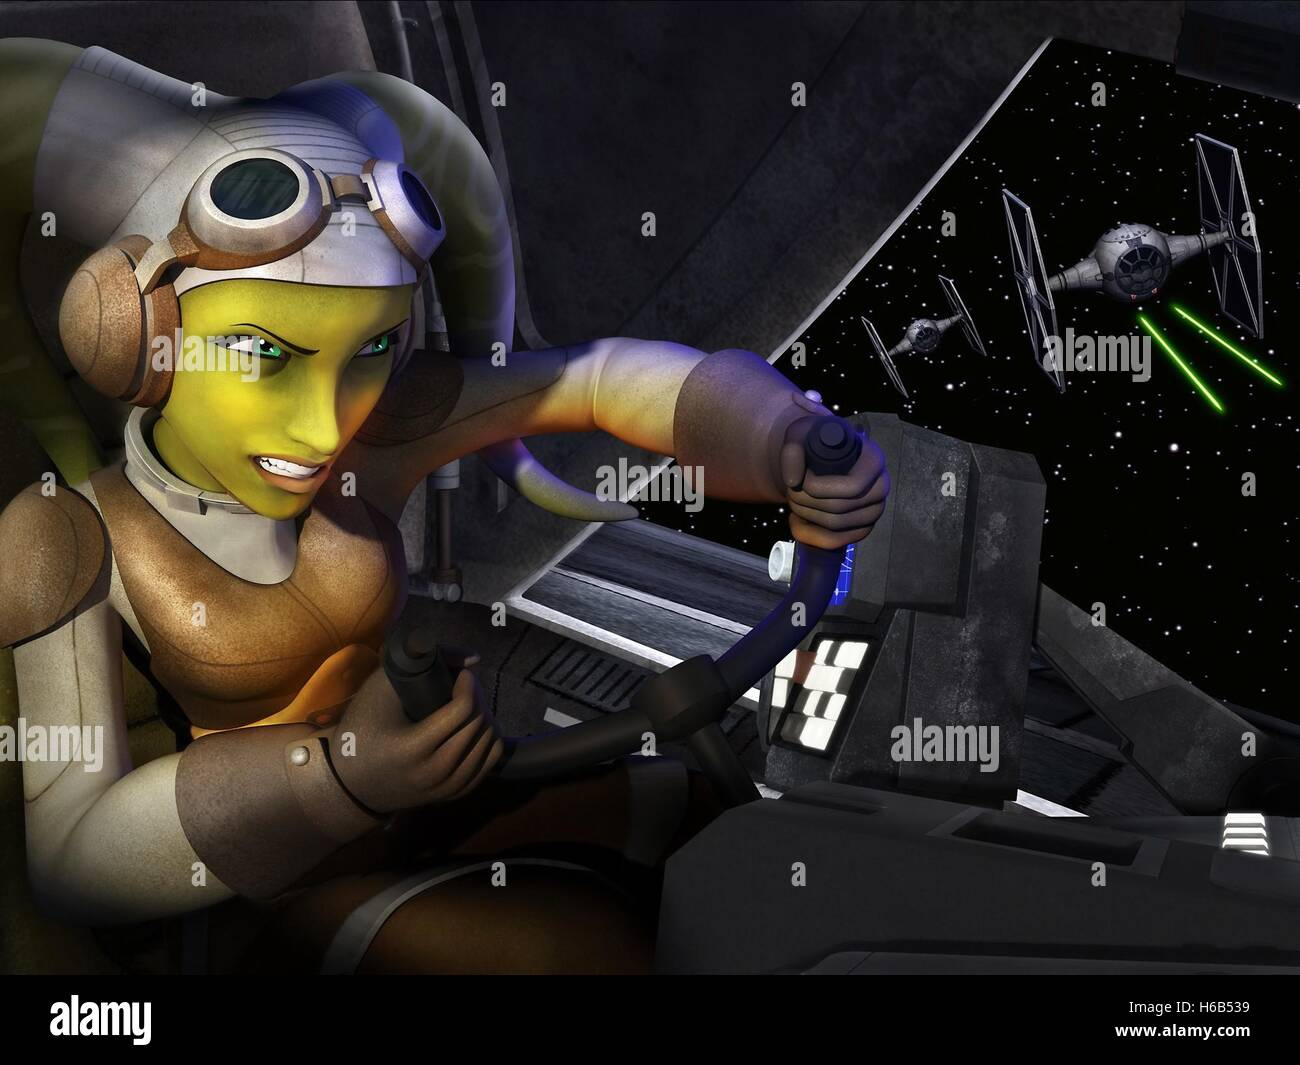 HERA SYNDULLA STAR WARS REBELS (2014) - Stock Image